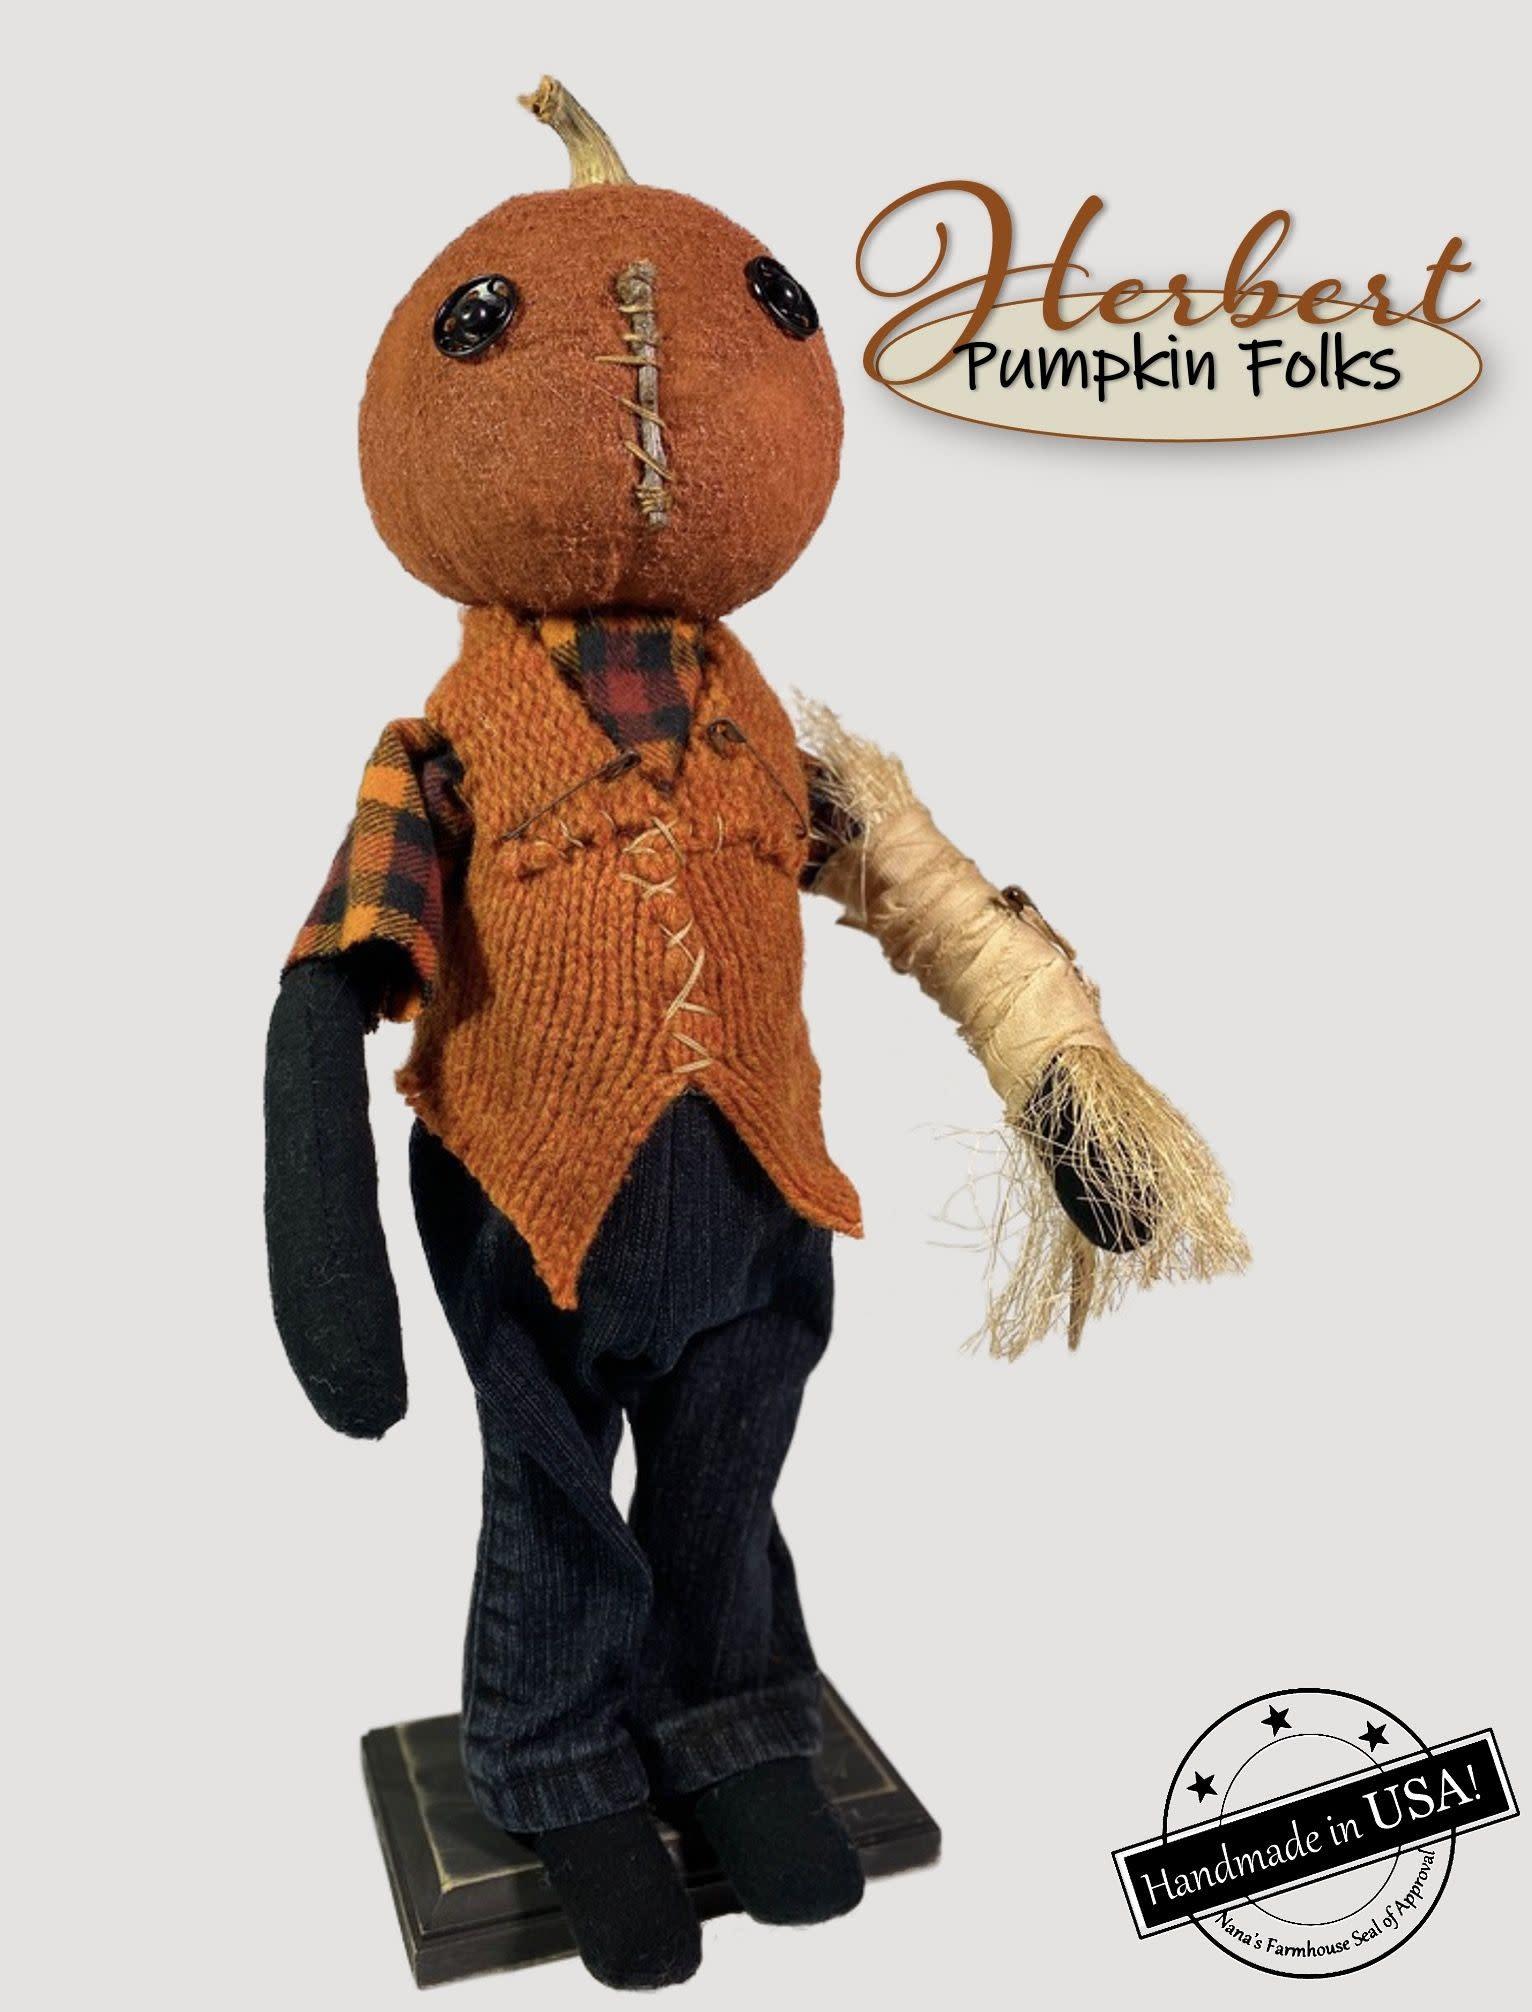 Nana's Farmhouse Herbert The Pumpkin Doll with Wrapped Arm